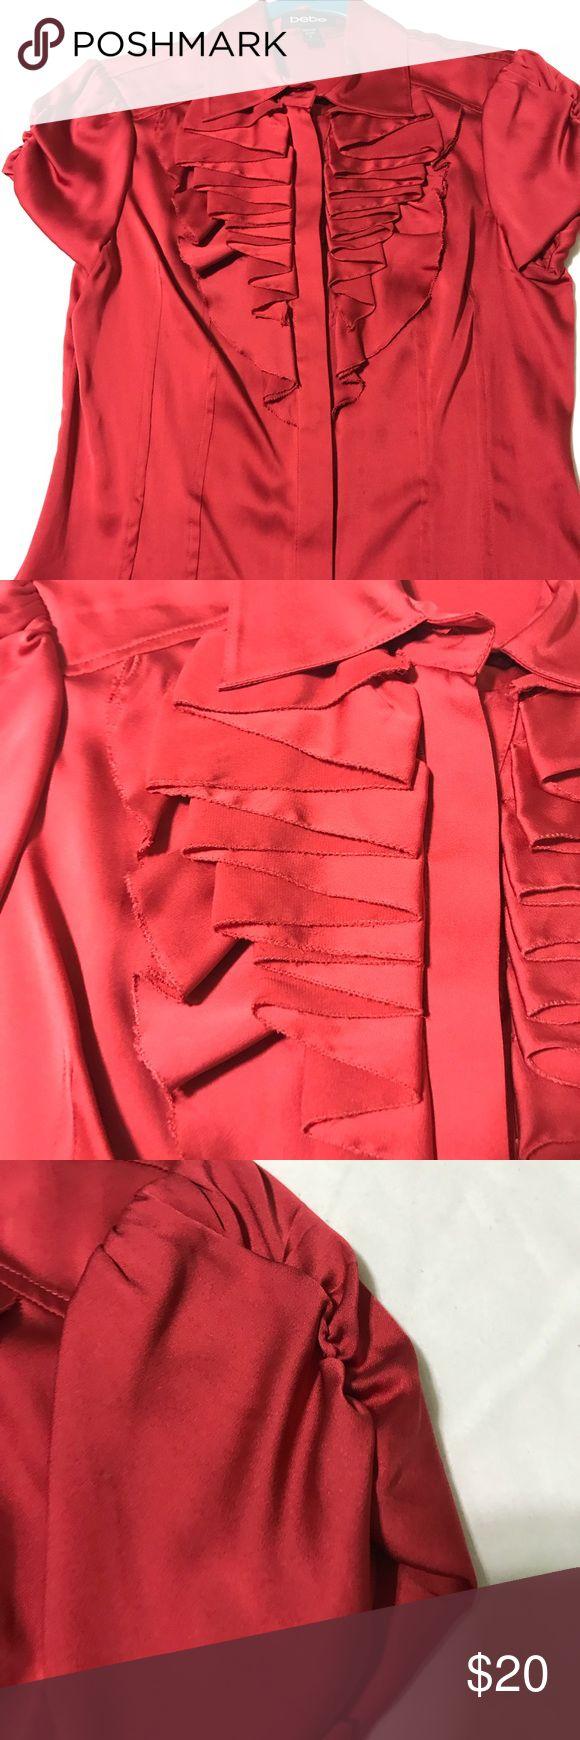 Bebe blouse Silky brick red ruffled blouse bebe Tops Blouses